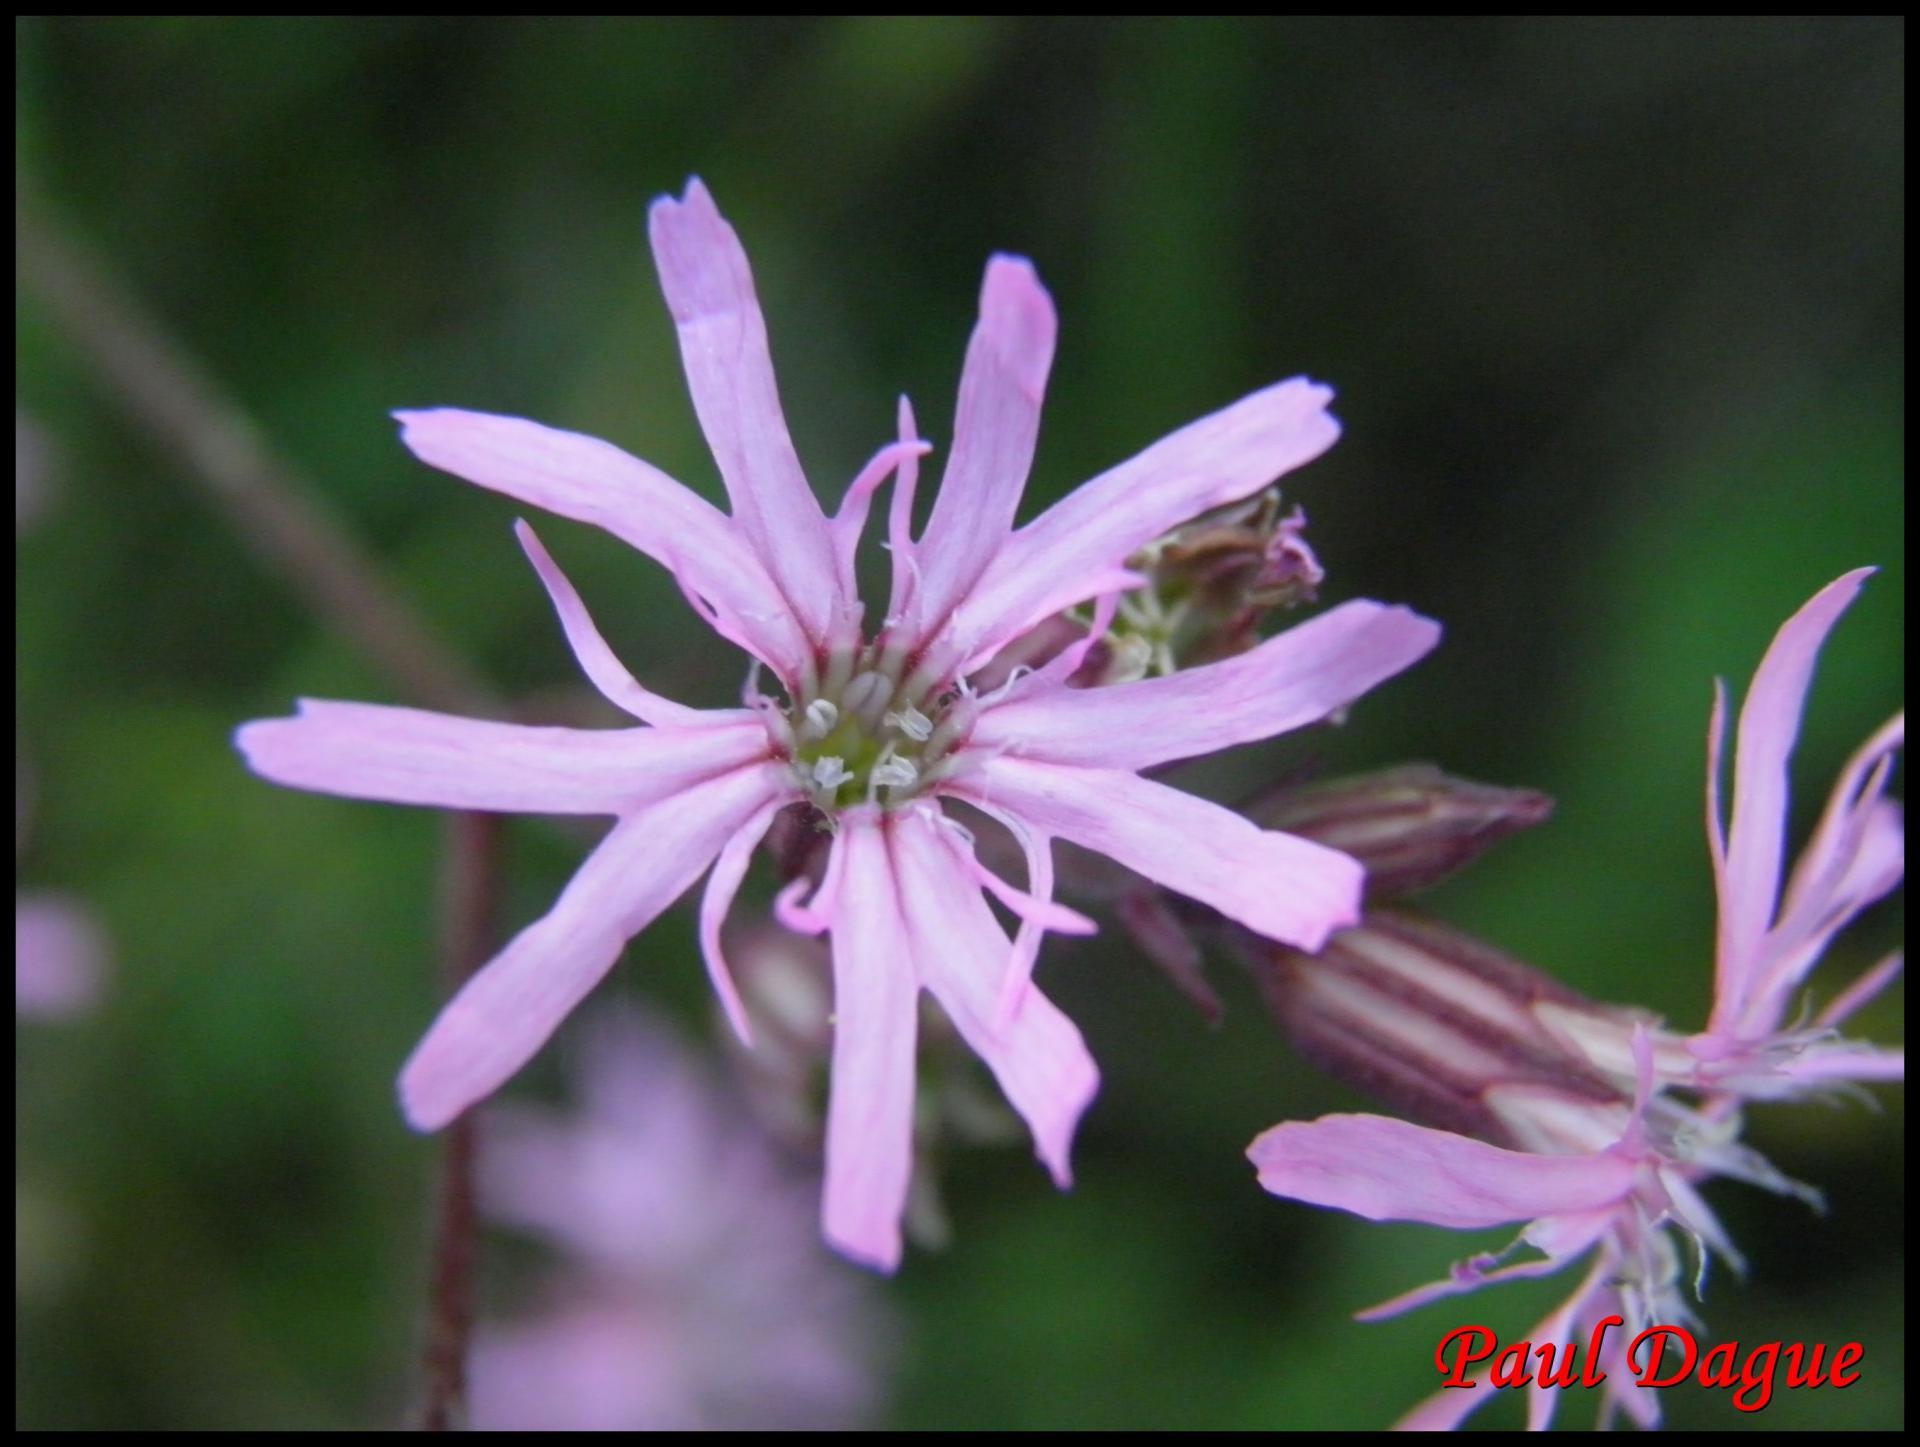 53 silene fleur de coucou silene flos cuculi caryophyllacée